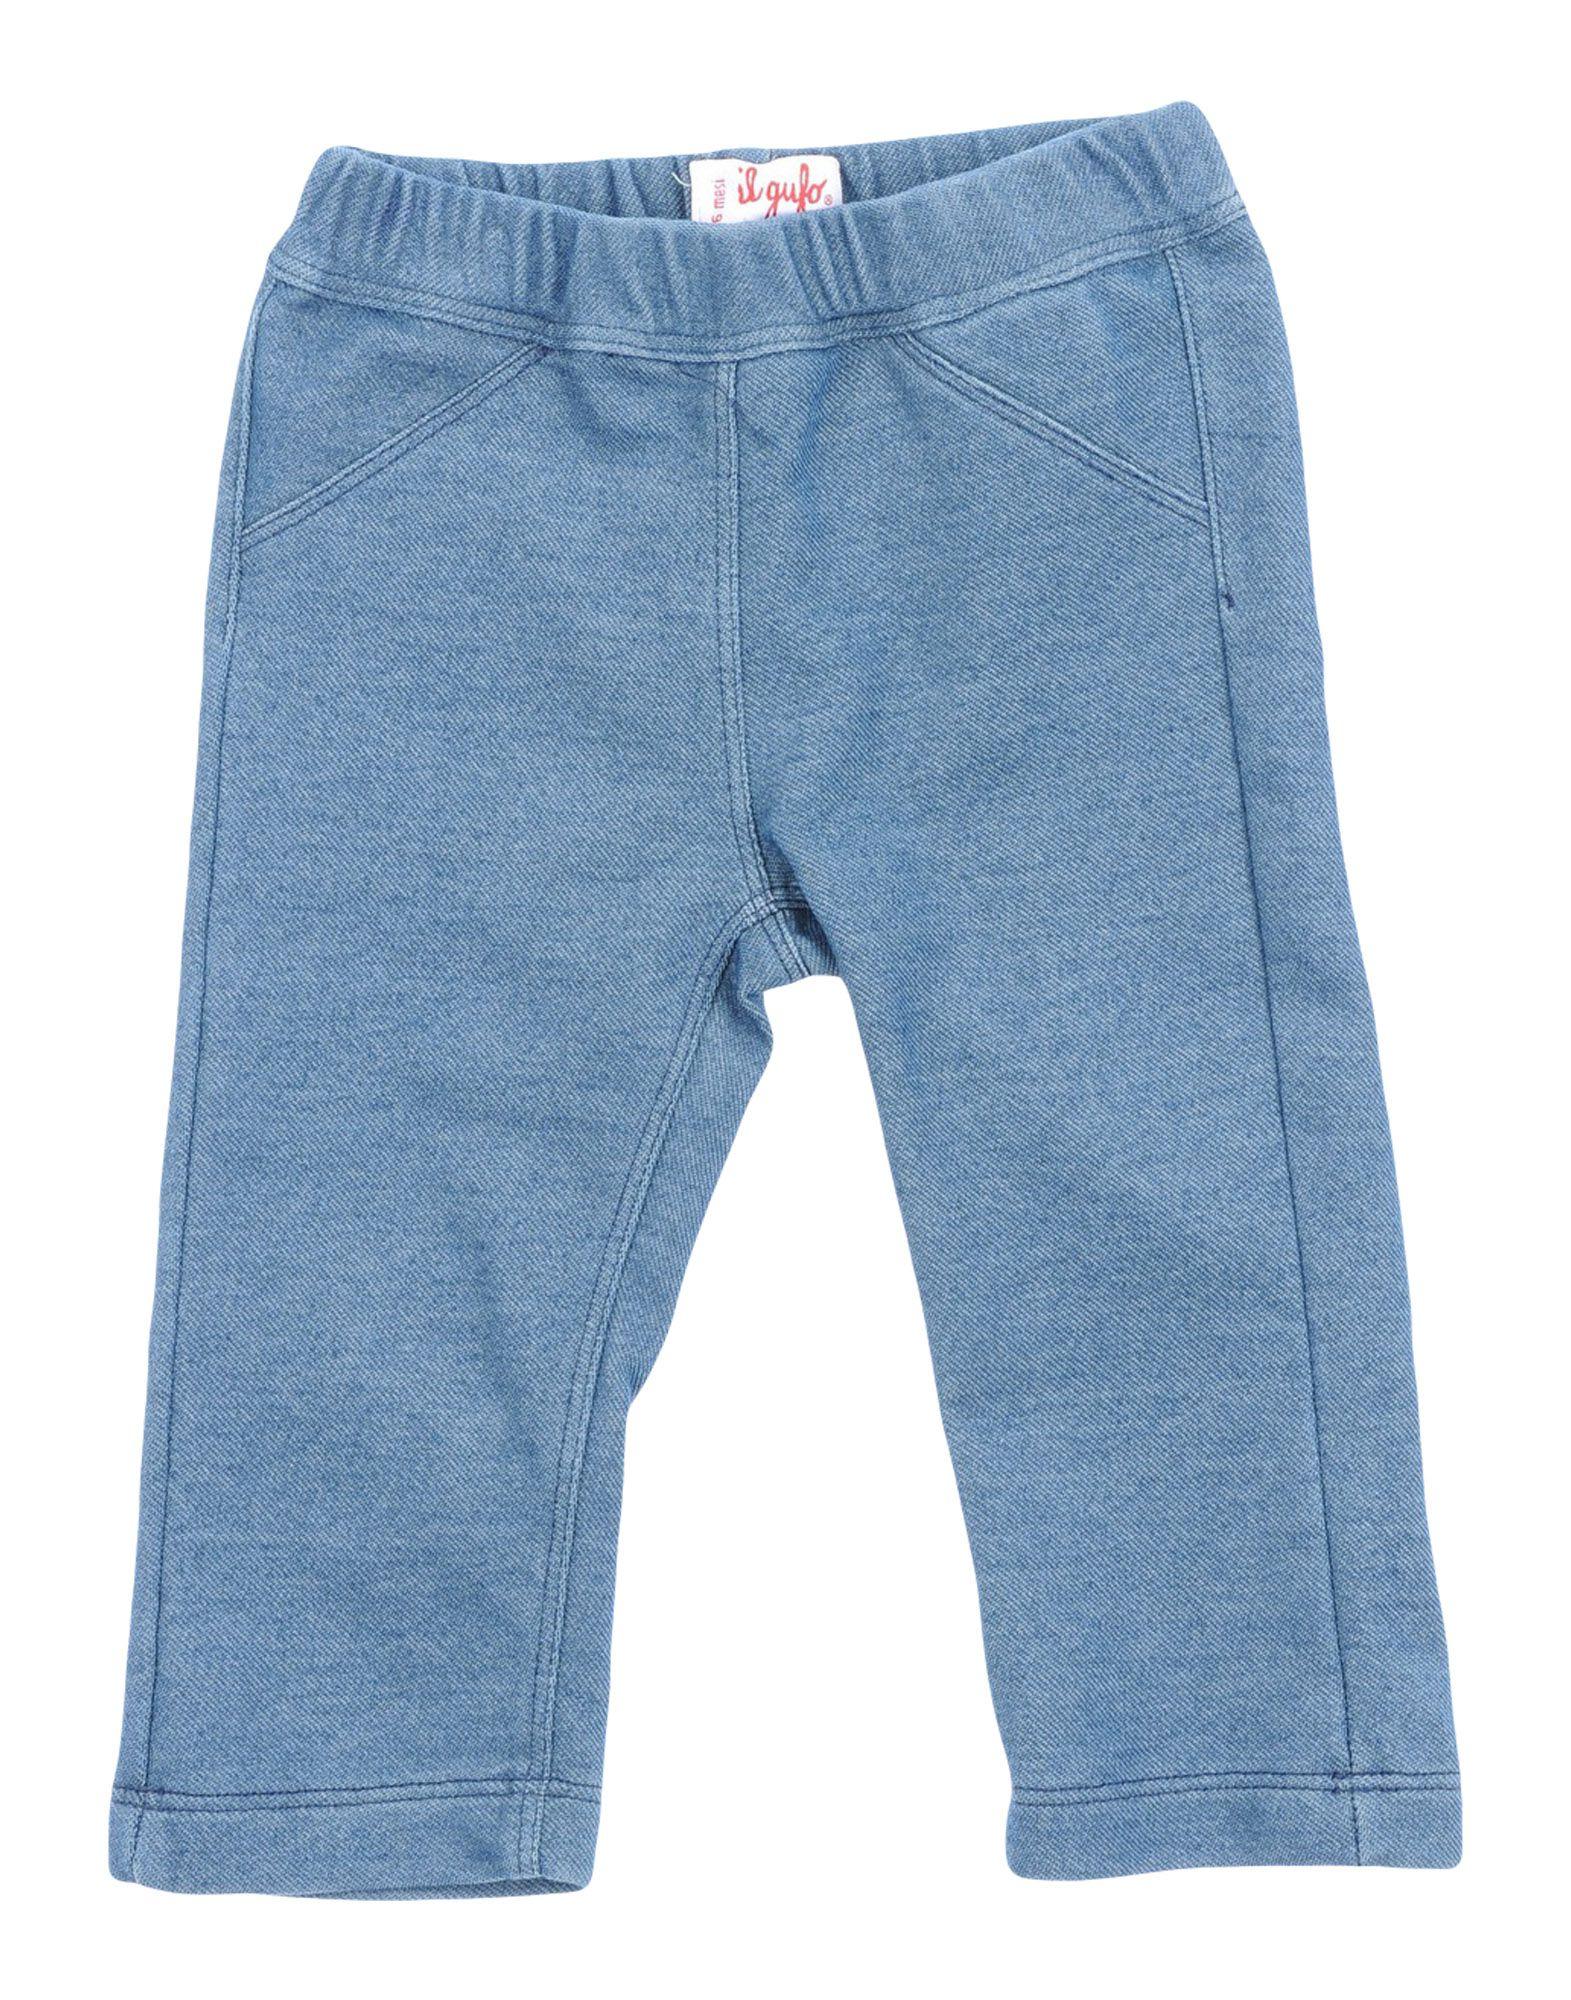 Pantalone Il Gufo Bambino Bambino Bambino 0-24 mesi a4c